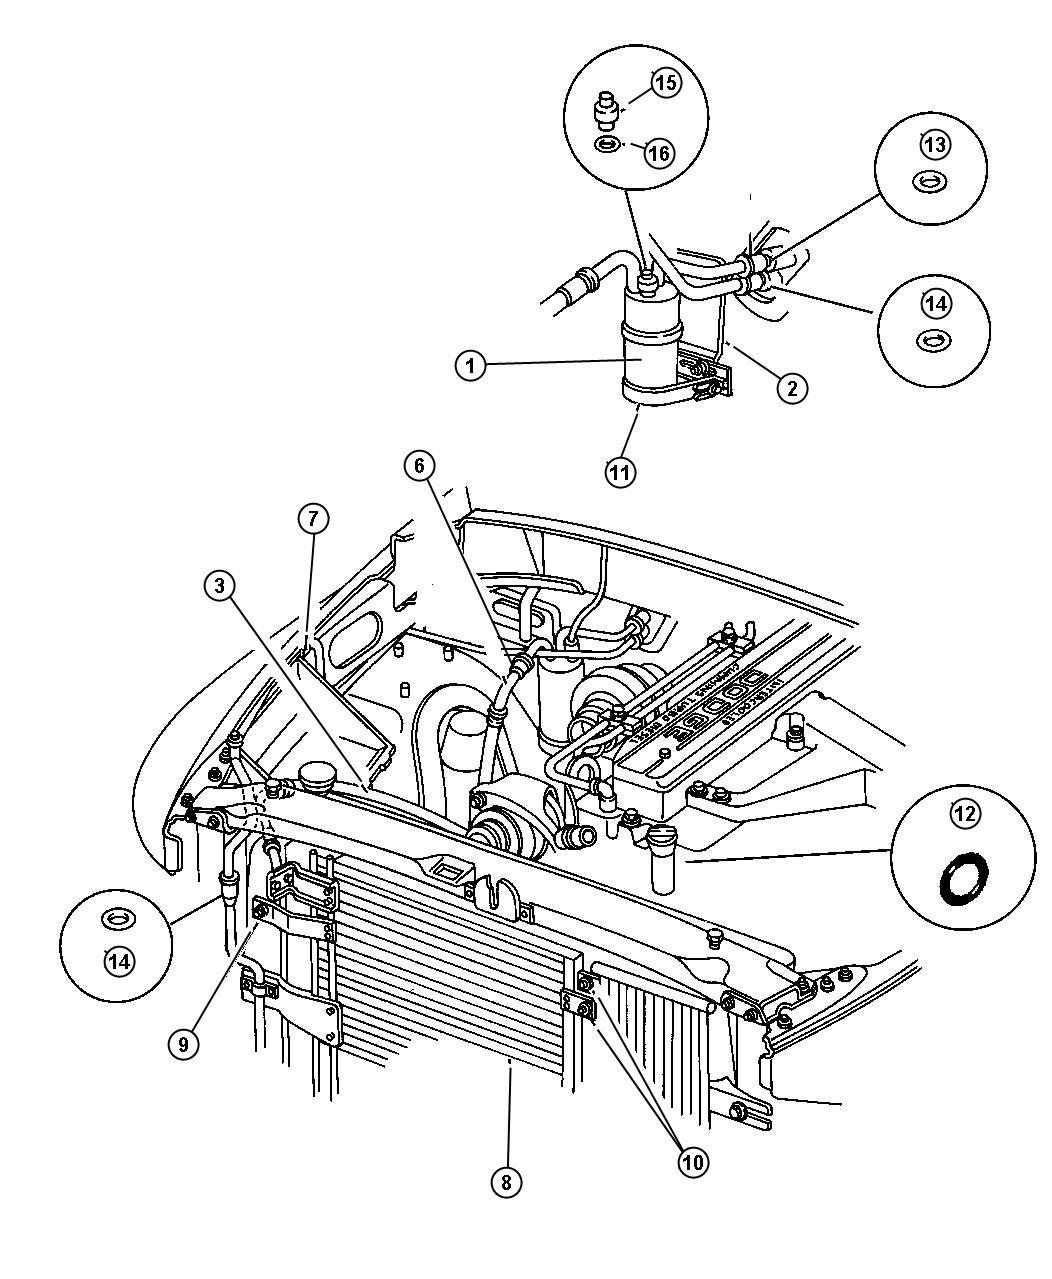 Dodge Ram Plumbing Air Conditioningsel Engine